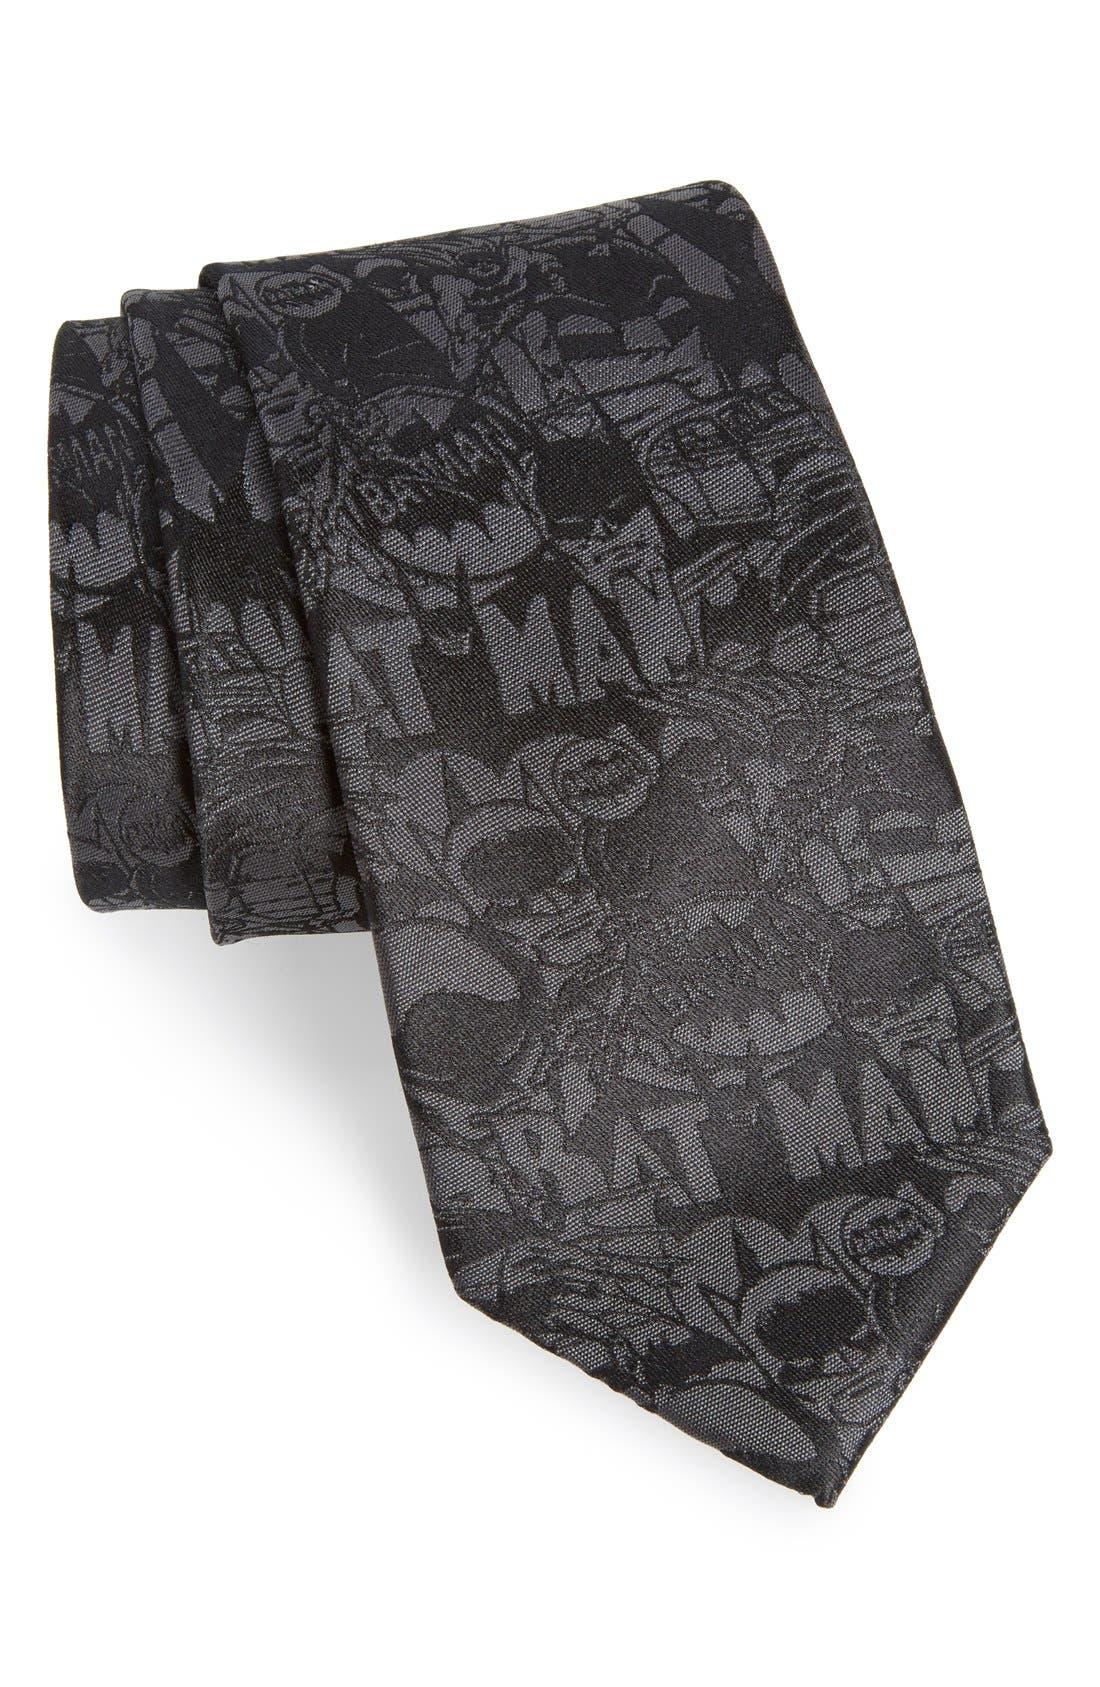 Alternate Image 1 Selected - Cufflinks, Inc. 'Batman' Silk Tie